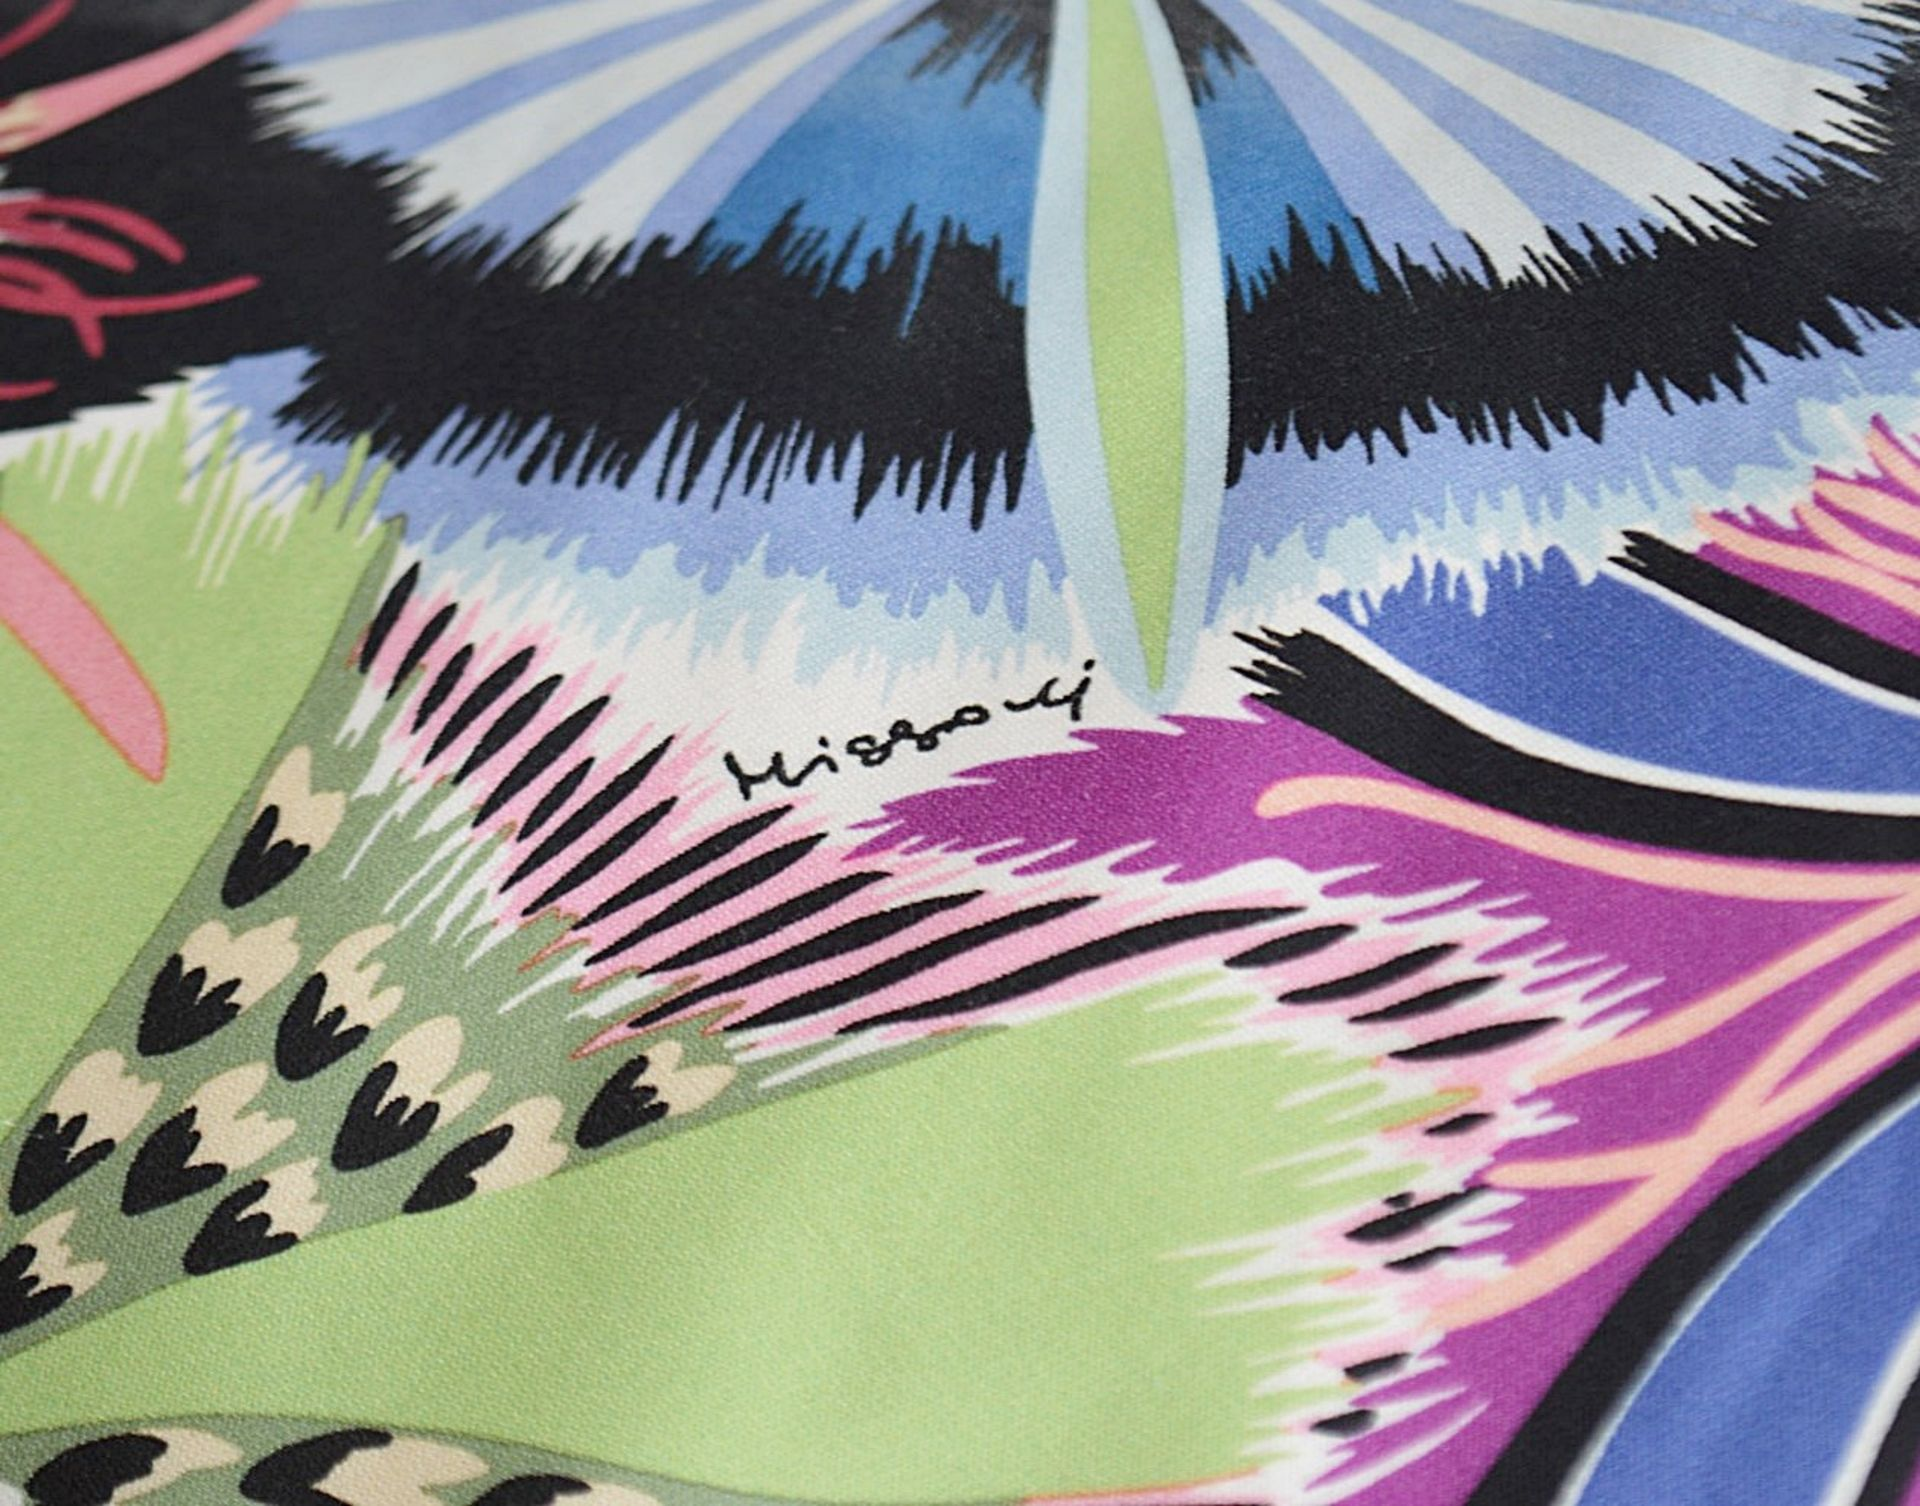 1 x Large Bean Bag Chair In 'Missoni Passiflora' Fabric - Dimensions Height 100 x Diameter 70cm - Image 4 of 5